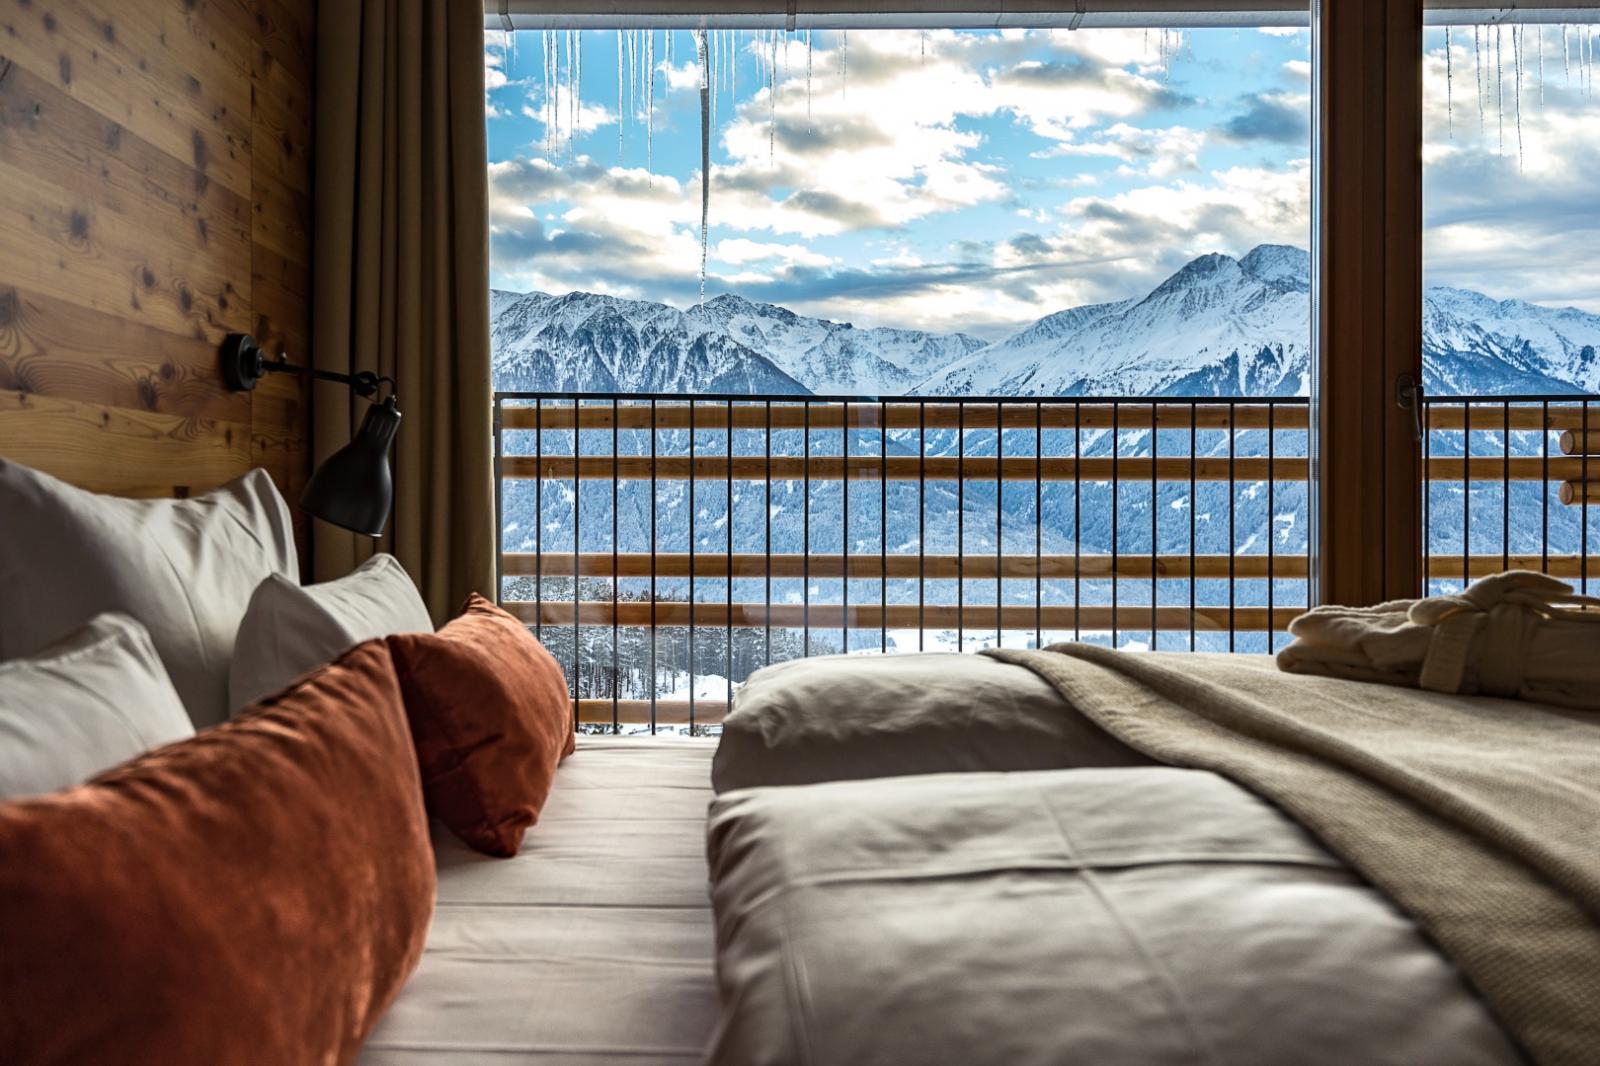 nidum casual luxury hotel m sern hotelbewertung. Black Bedroom Furniture Sets. Home Design Ideas